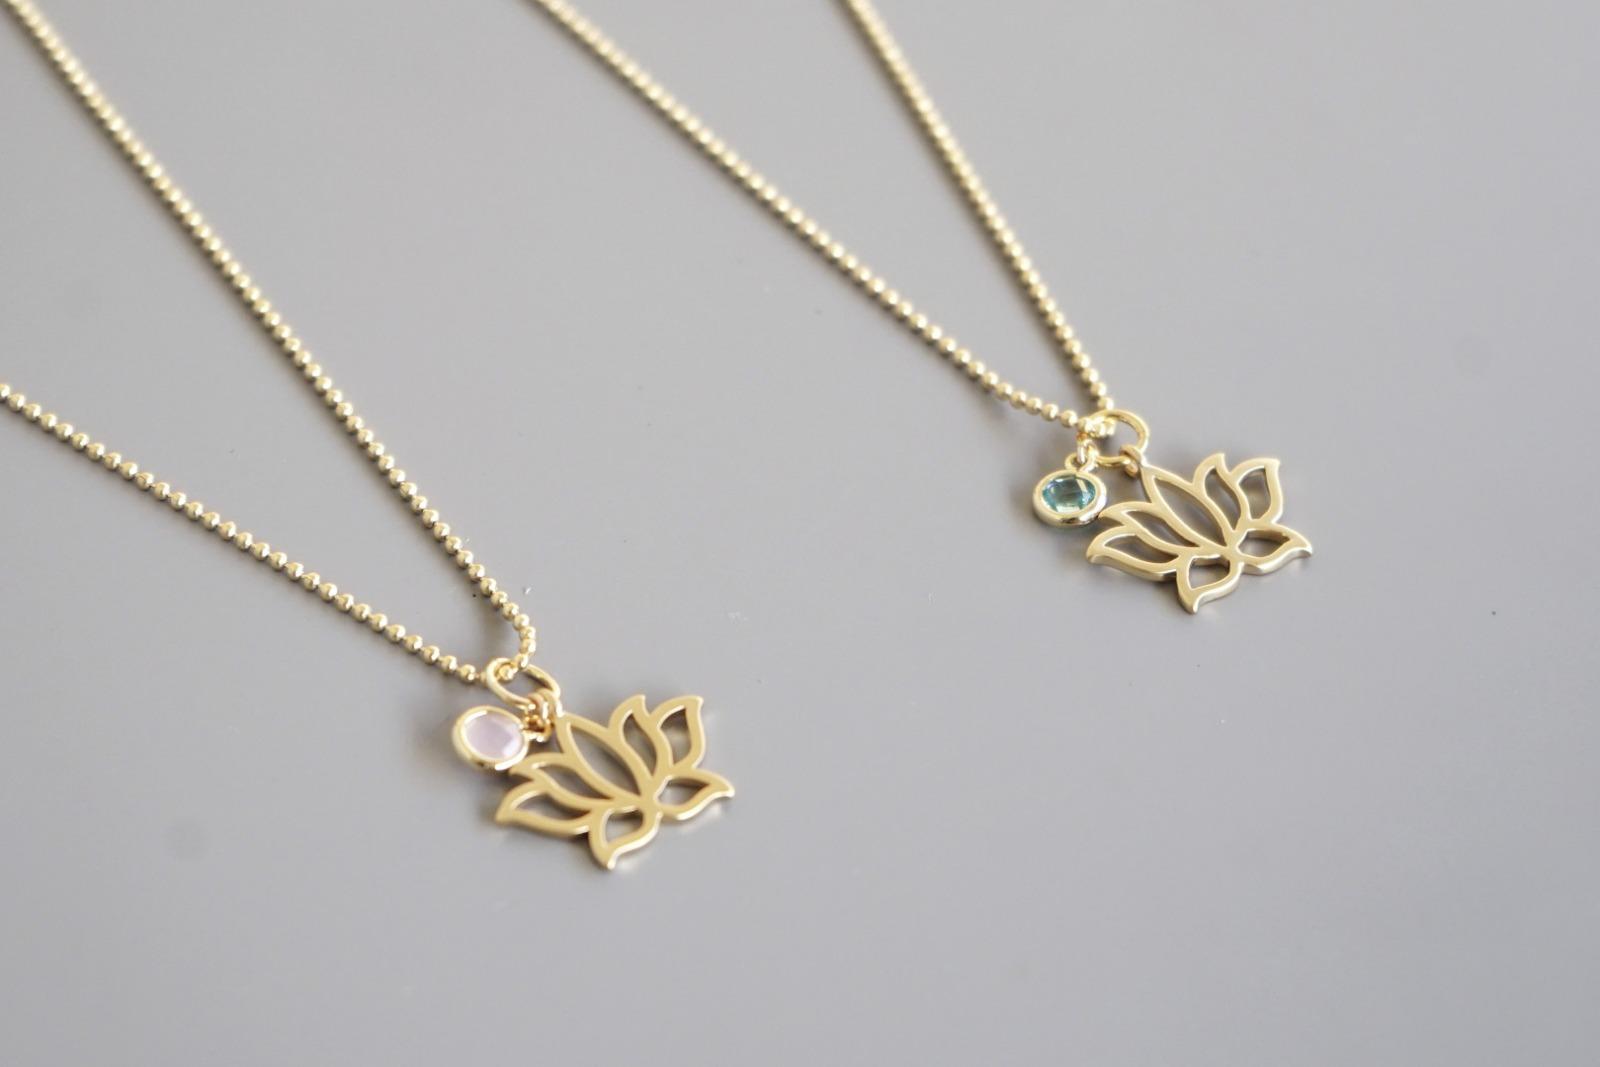 Kugelkette mit Lotusblüte und Kristall - türkis - 3